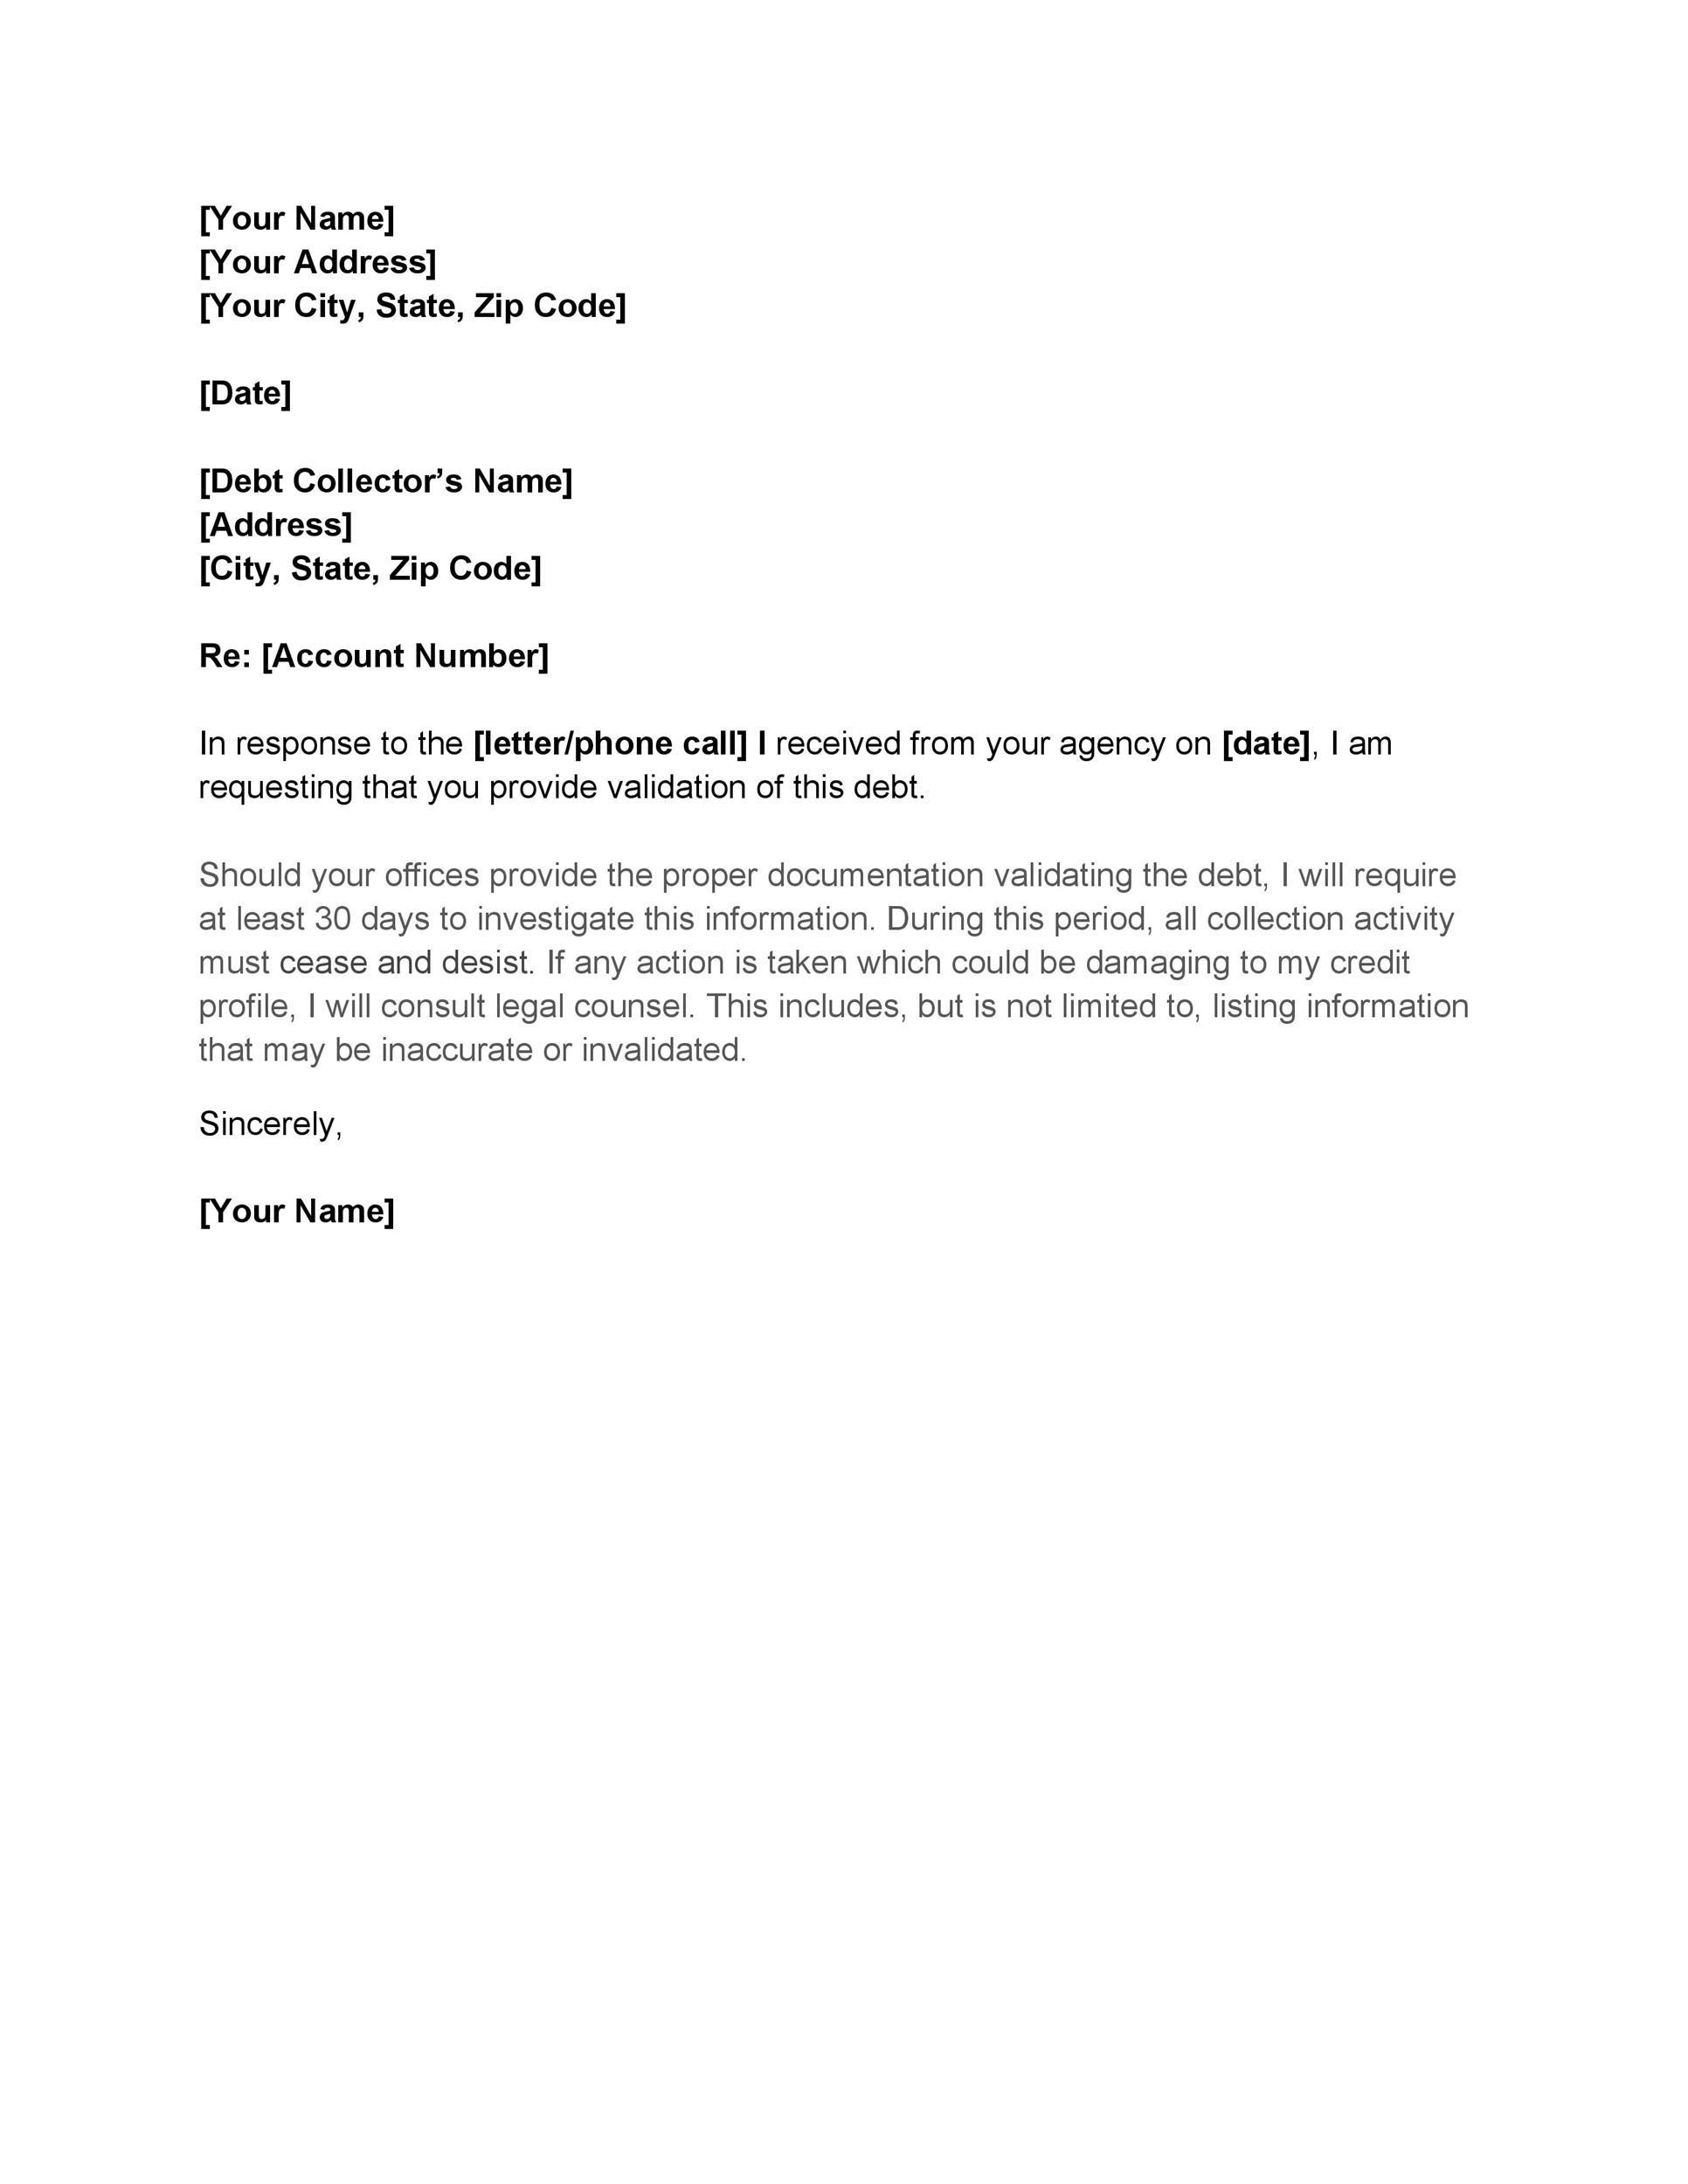 Free debt validation letter 21